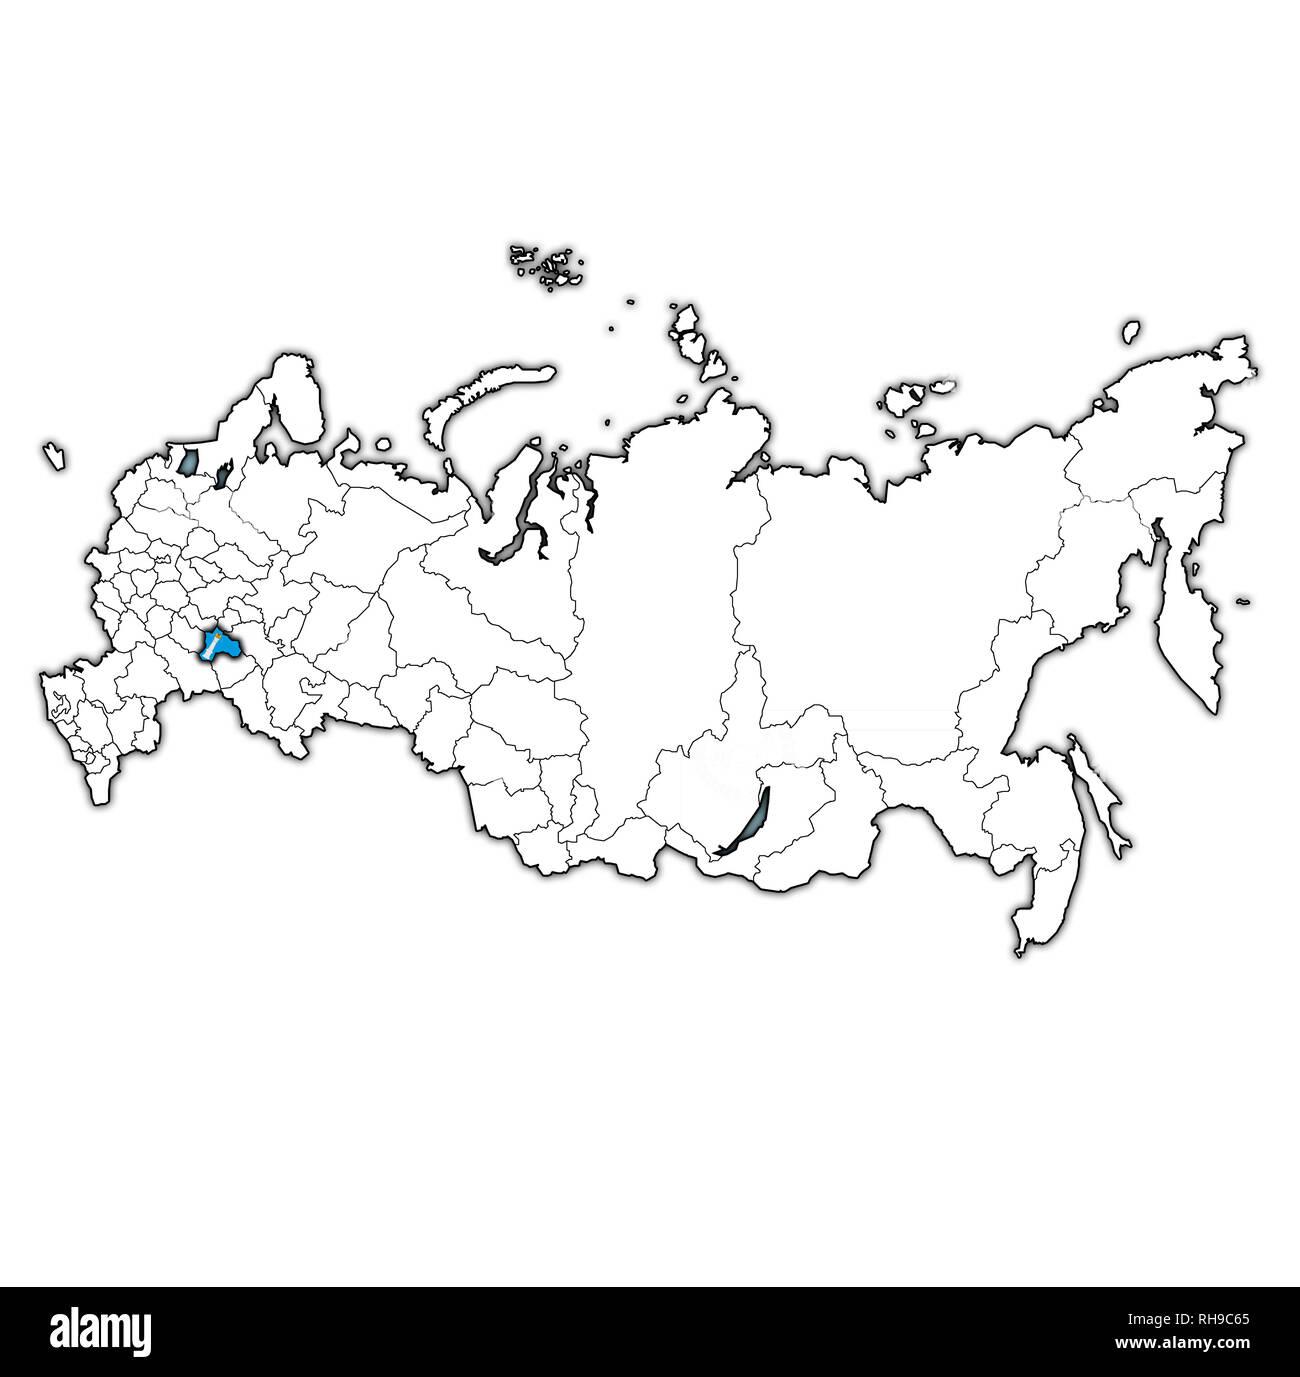 Administrative divisions of Ulyanovsk Oblast